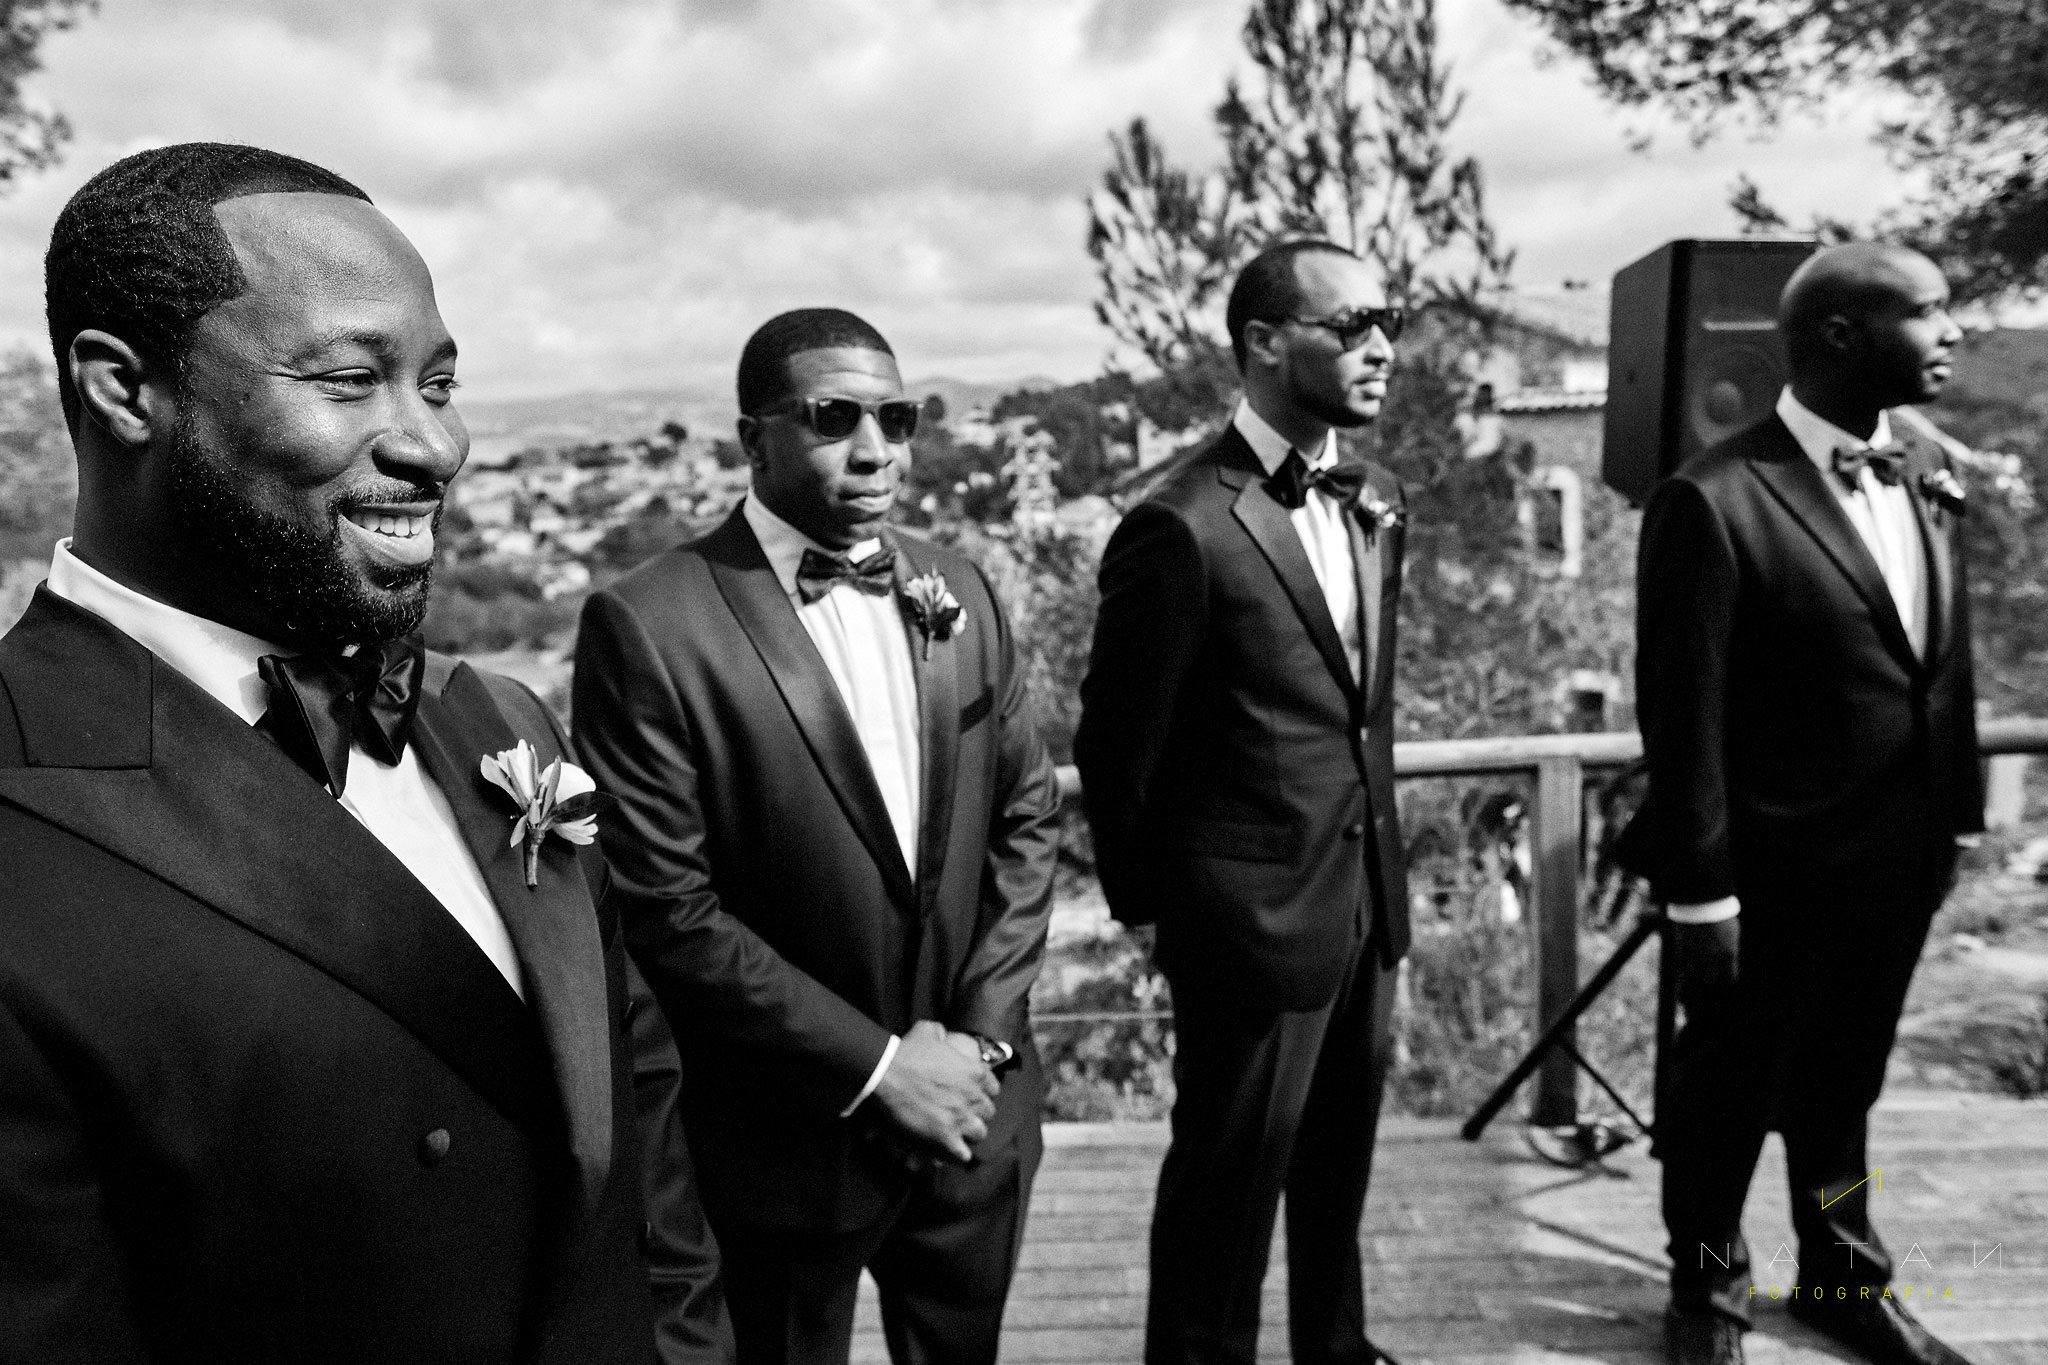 Groom & best men happy seeing bride arriving at ceremony